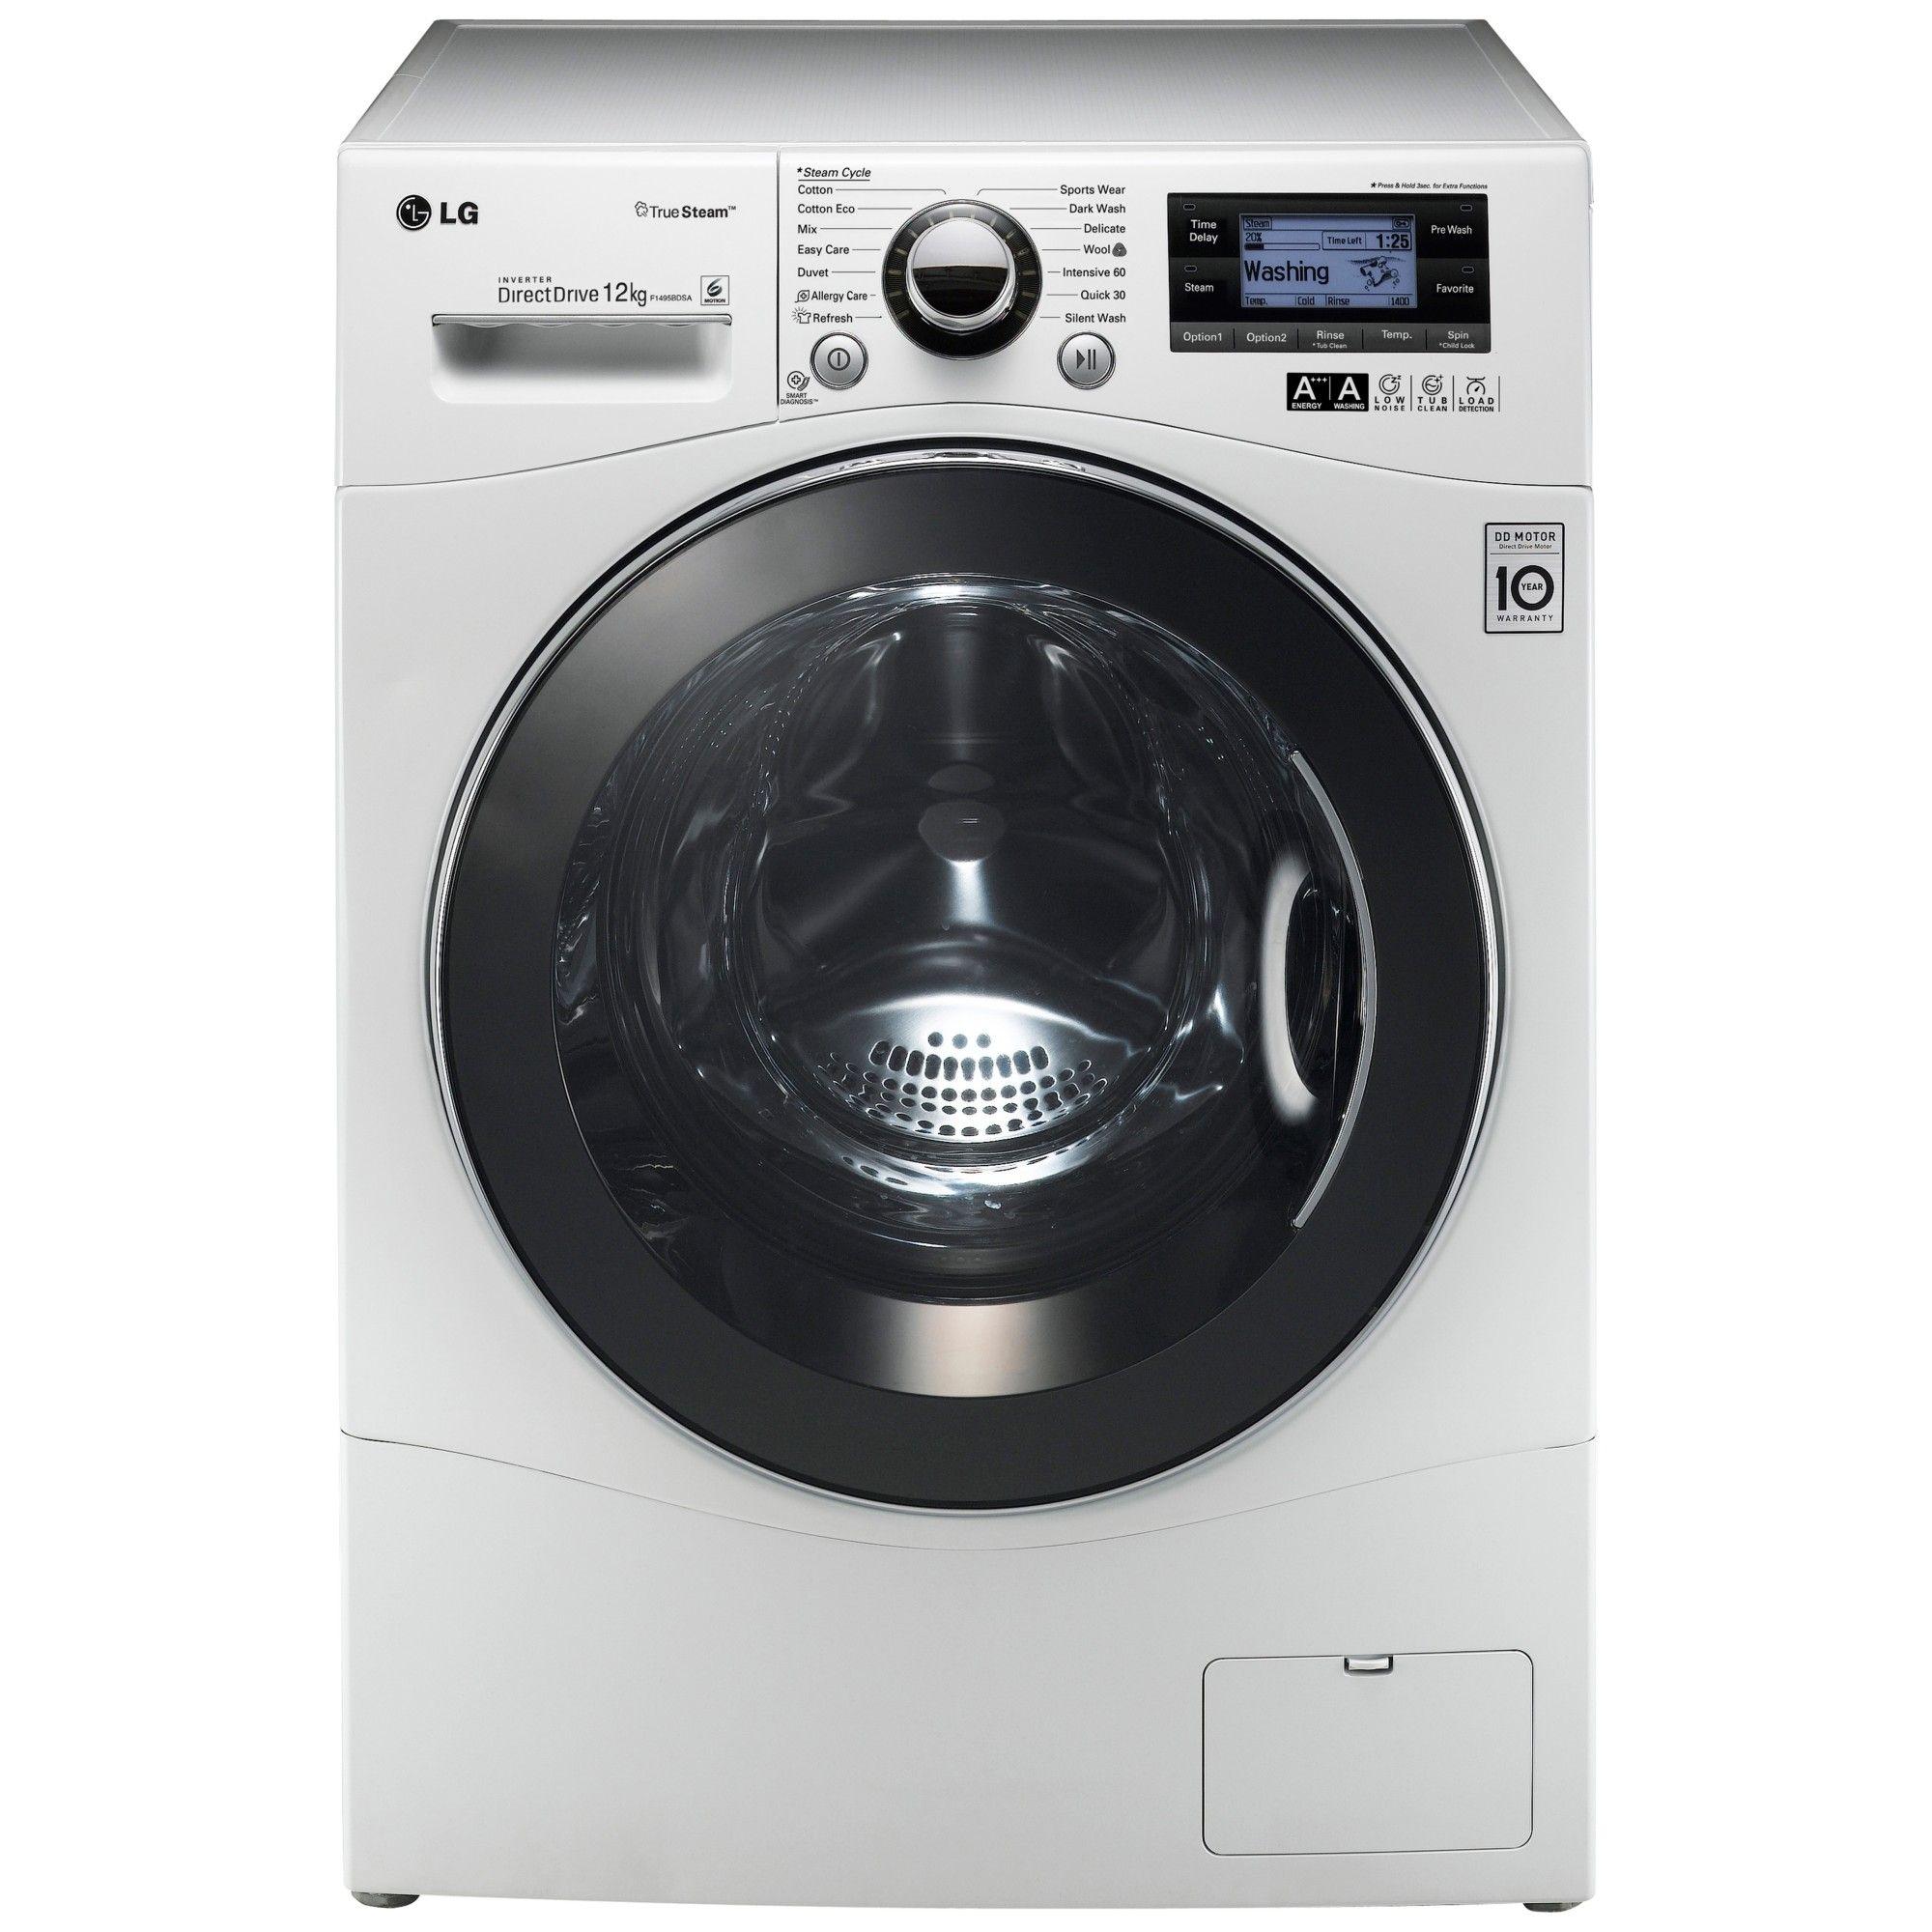 LG F1495BDSA 12kg 1400rpm Freestanding Washing Machine